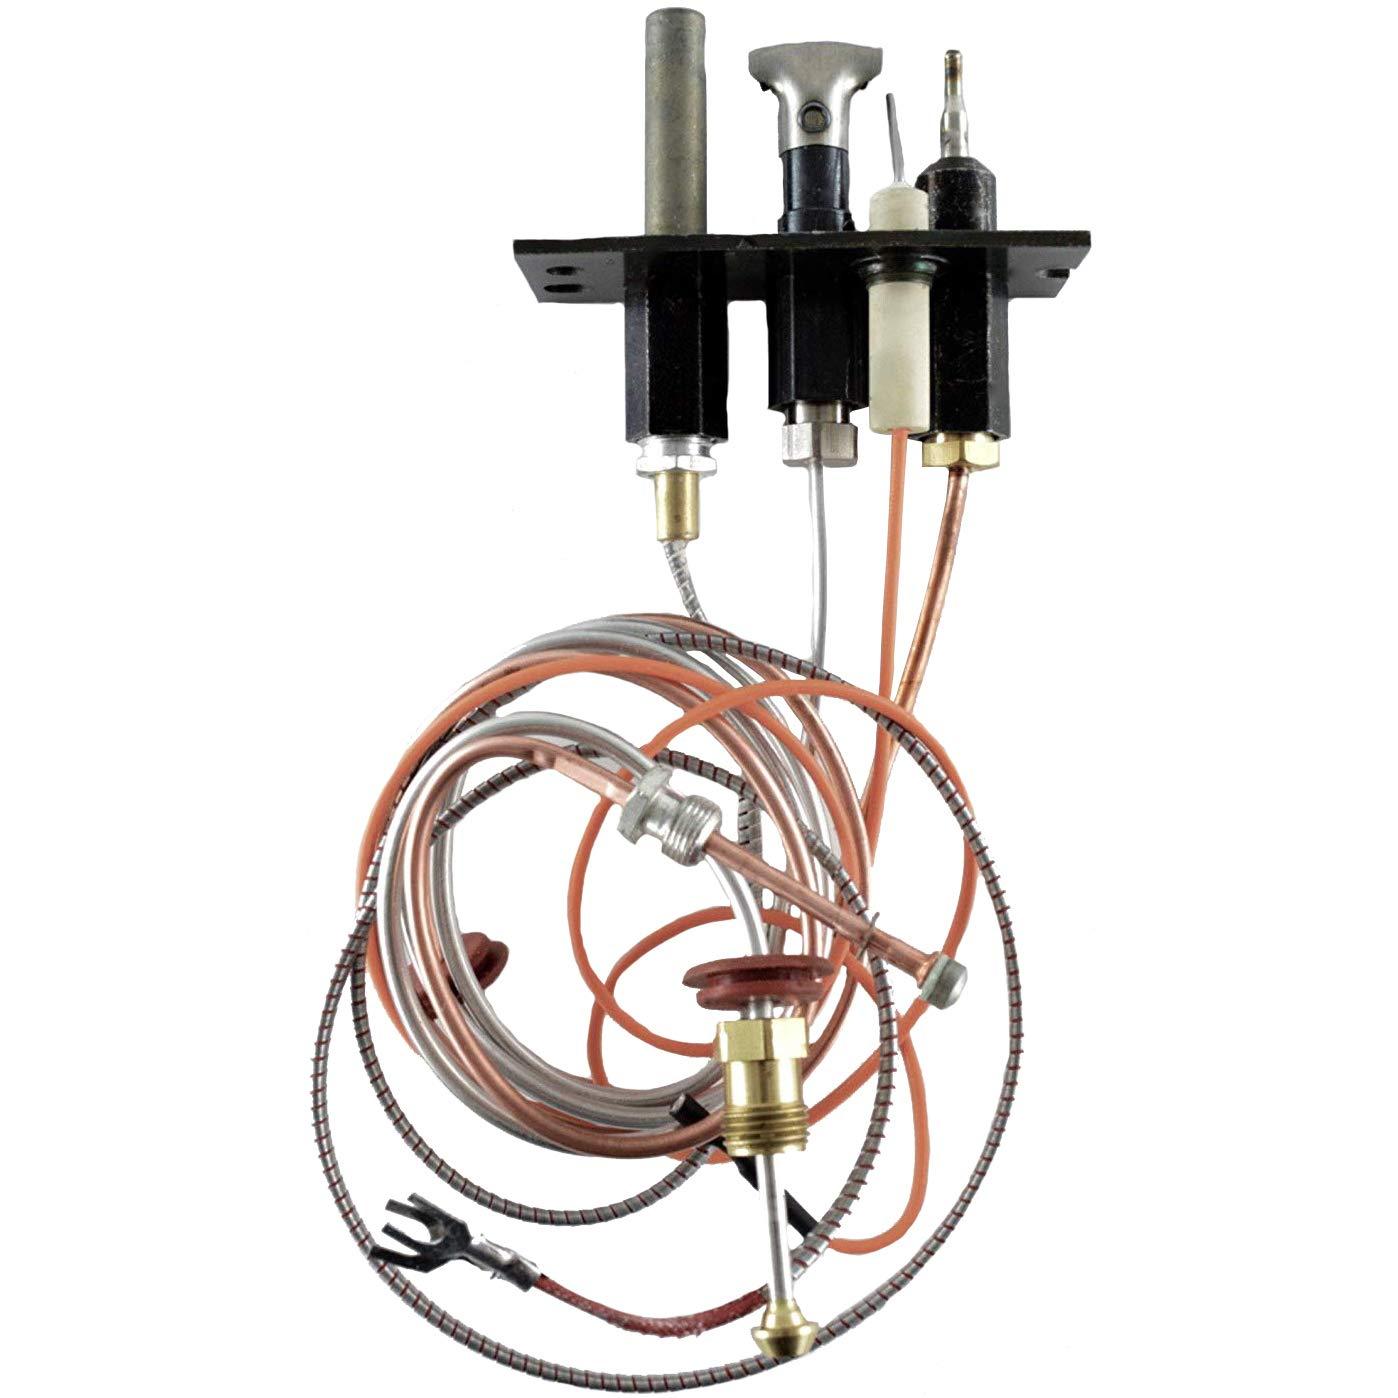 Quadra-Fire, Heat N Glo & Heatilator Pilot Assembly LP (2103-011) by HHT